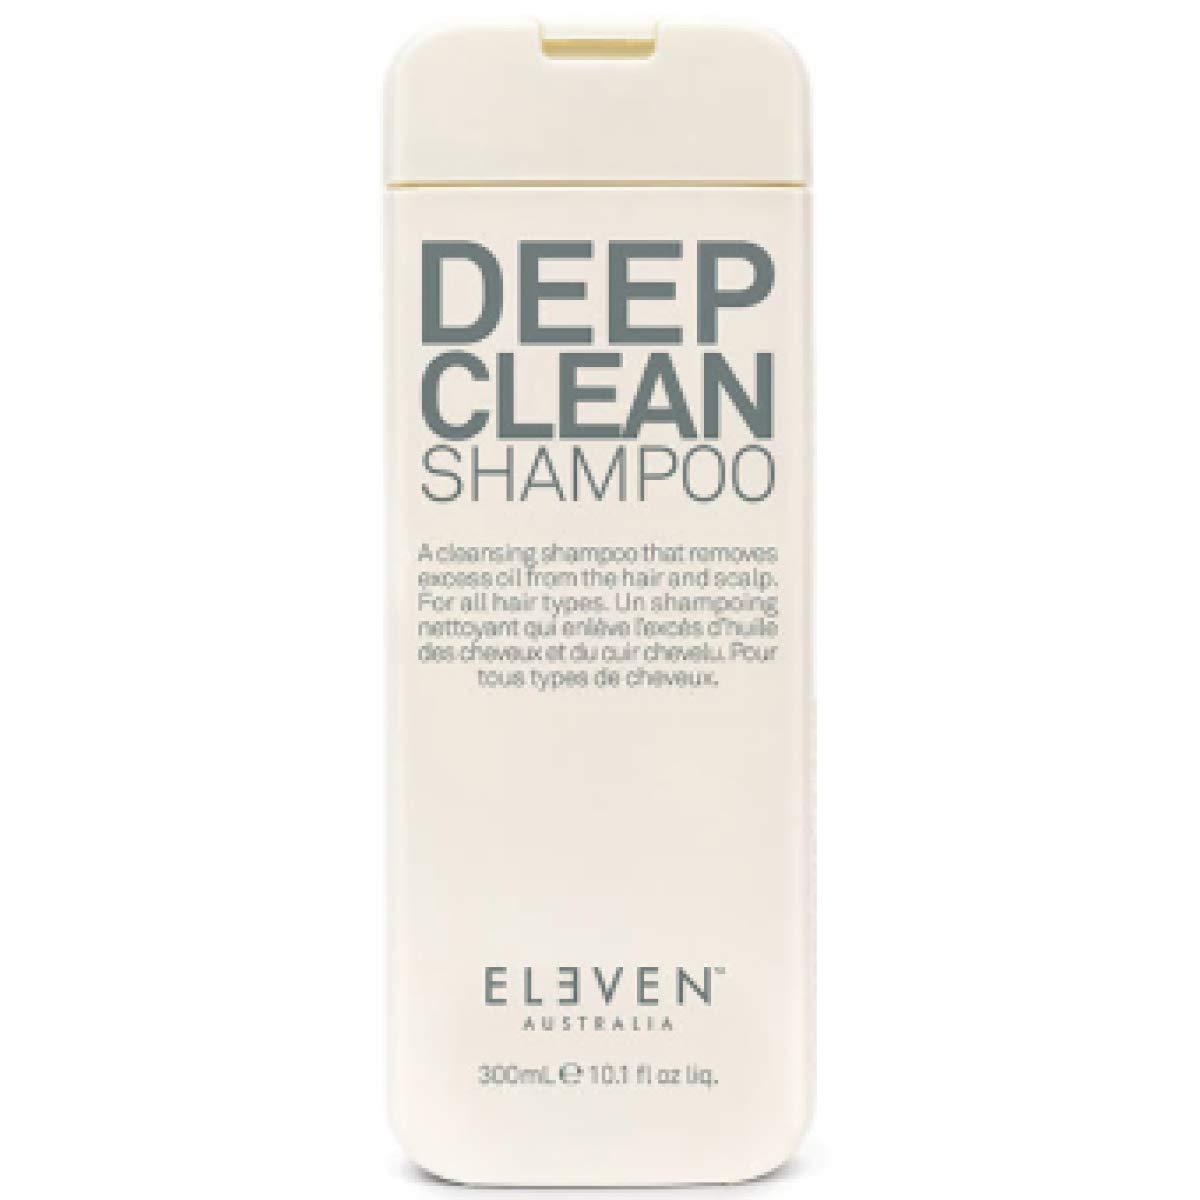 ELEVEN AUSTRALIA DEEP CLEAN SHAMPOO 300mL / 10.1 oz